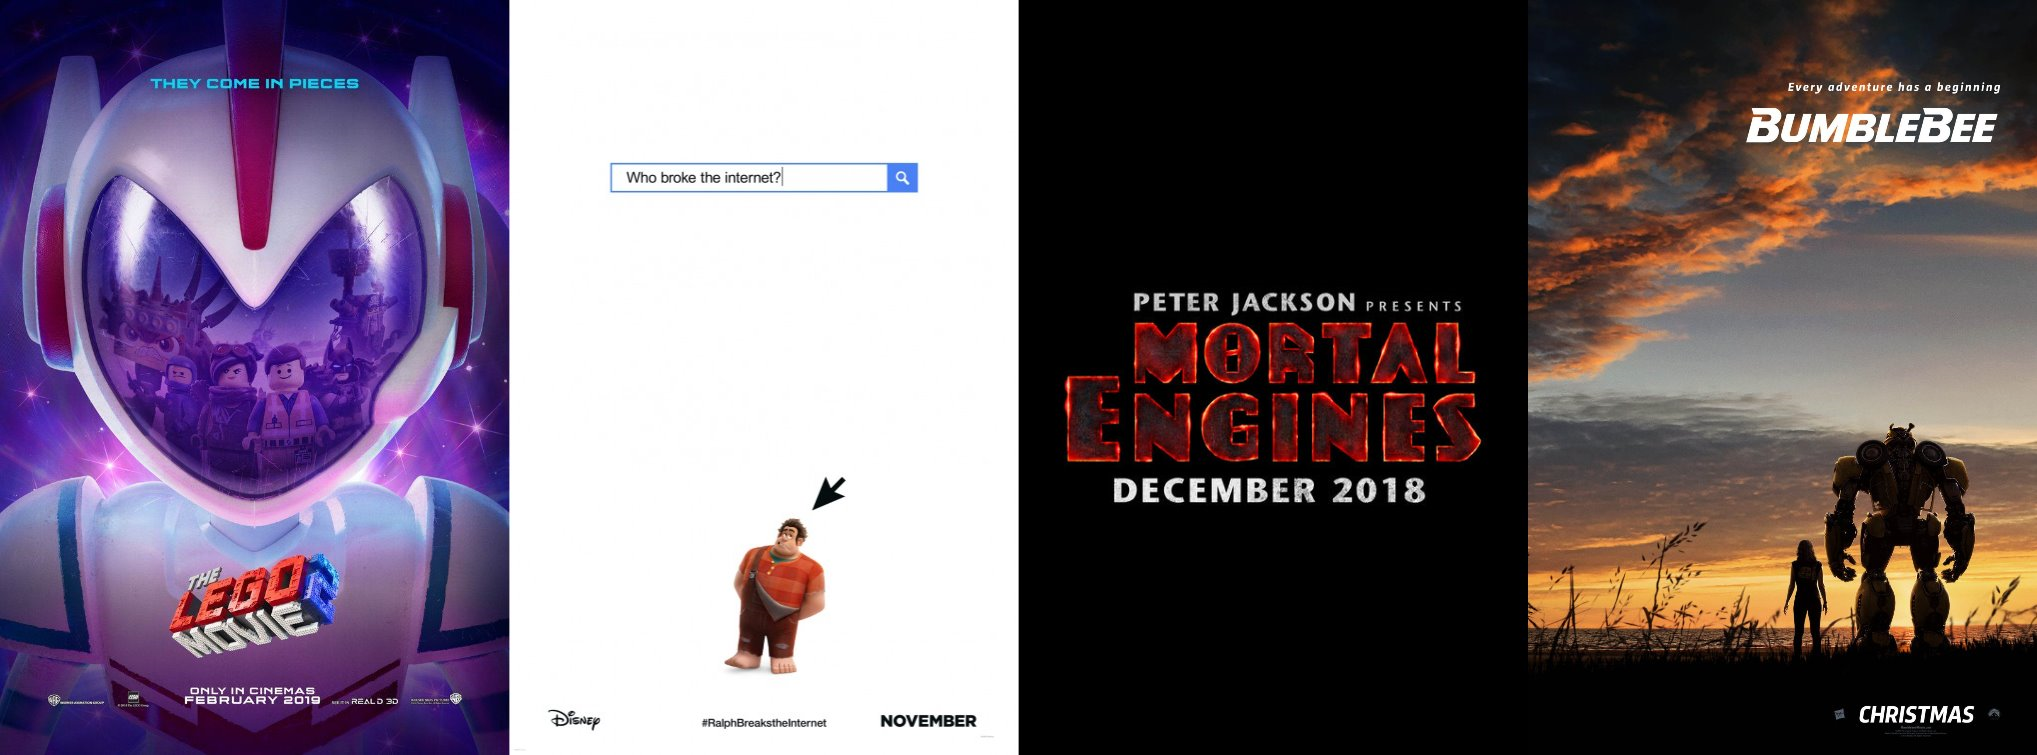 Trailer-Watchin' Wednesday - The Lego Movie 2, Mortal Instruments, Ralph Breaks the Internet, BONUS Bumblebee